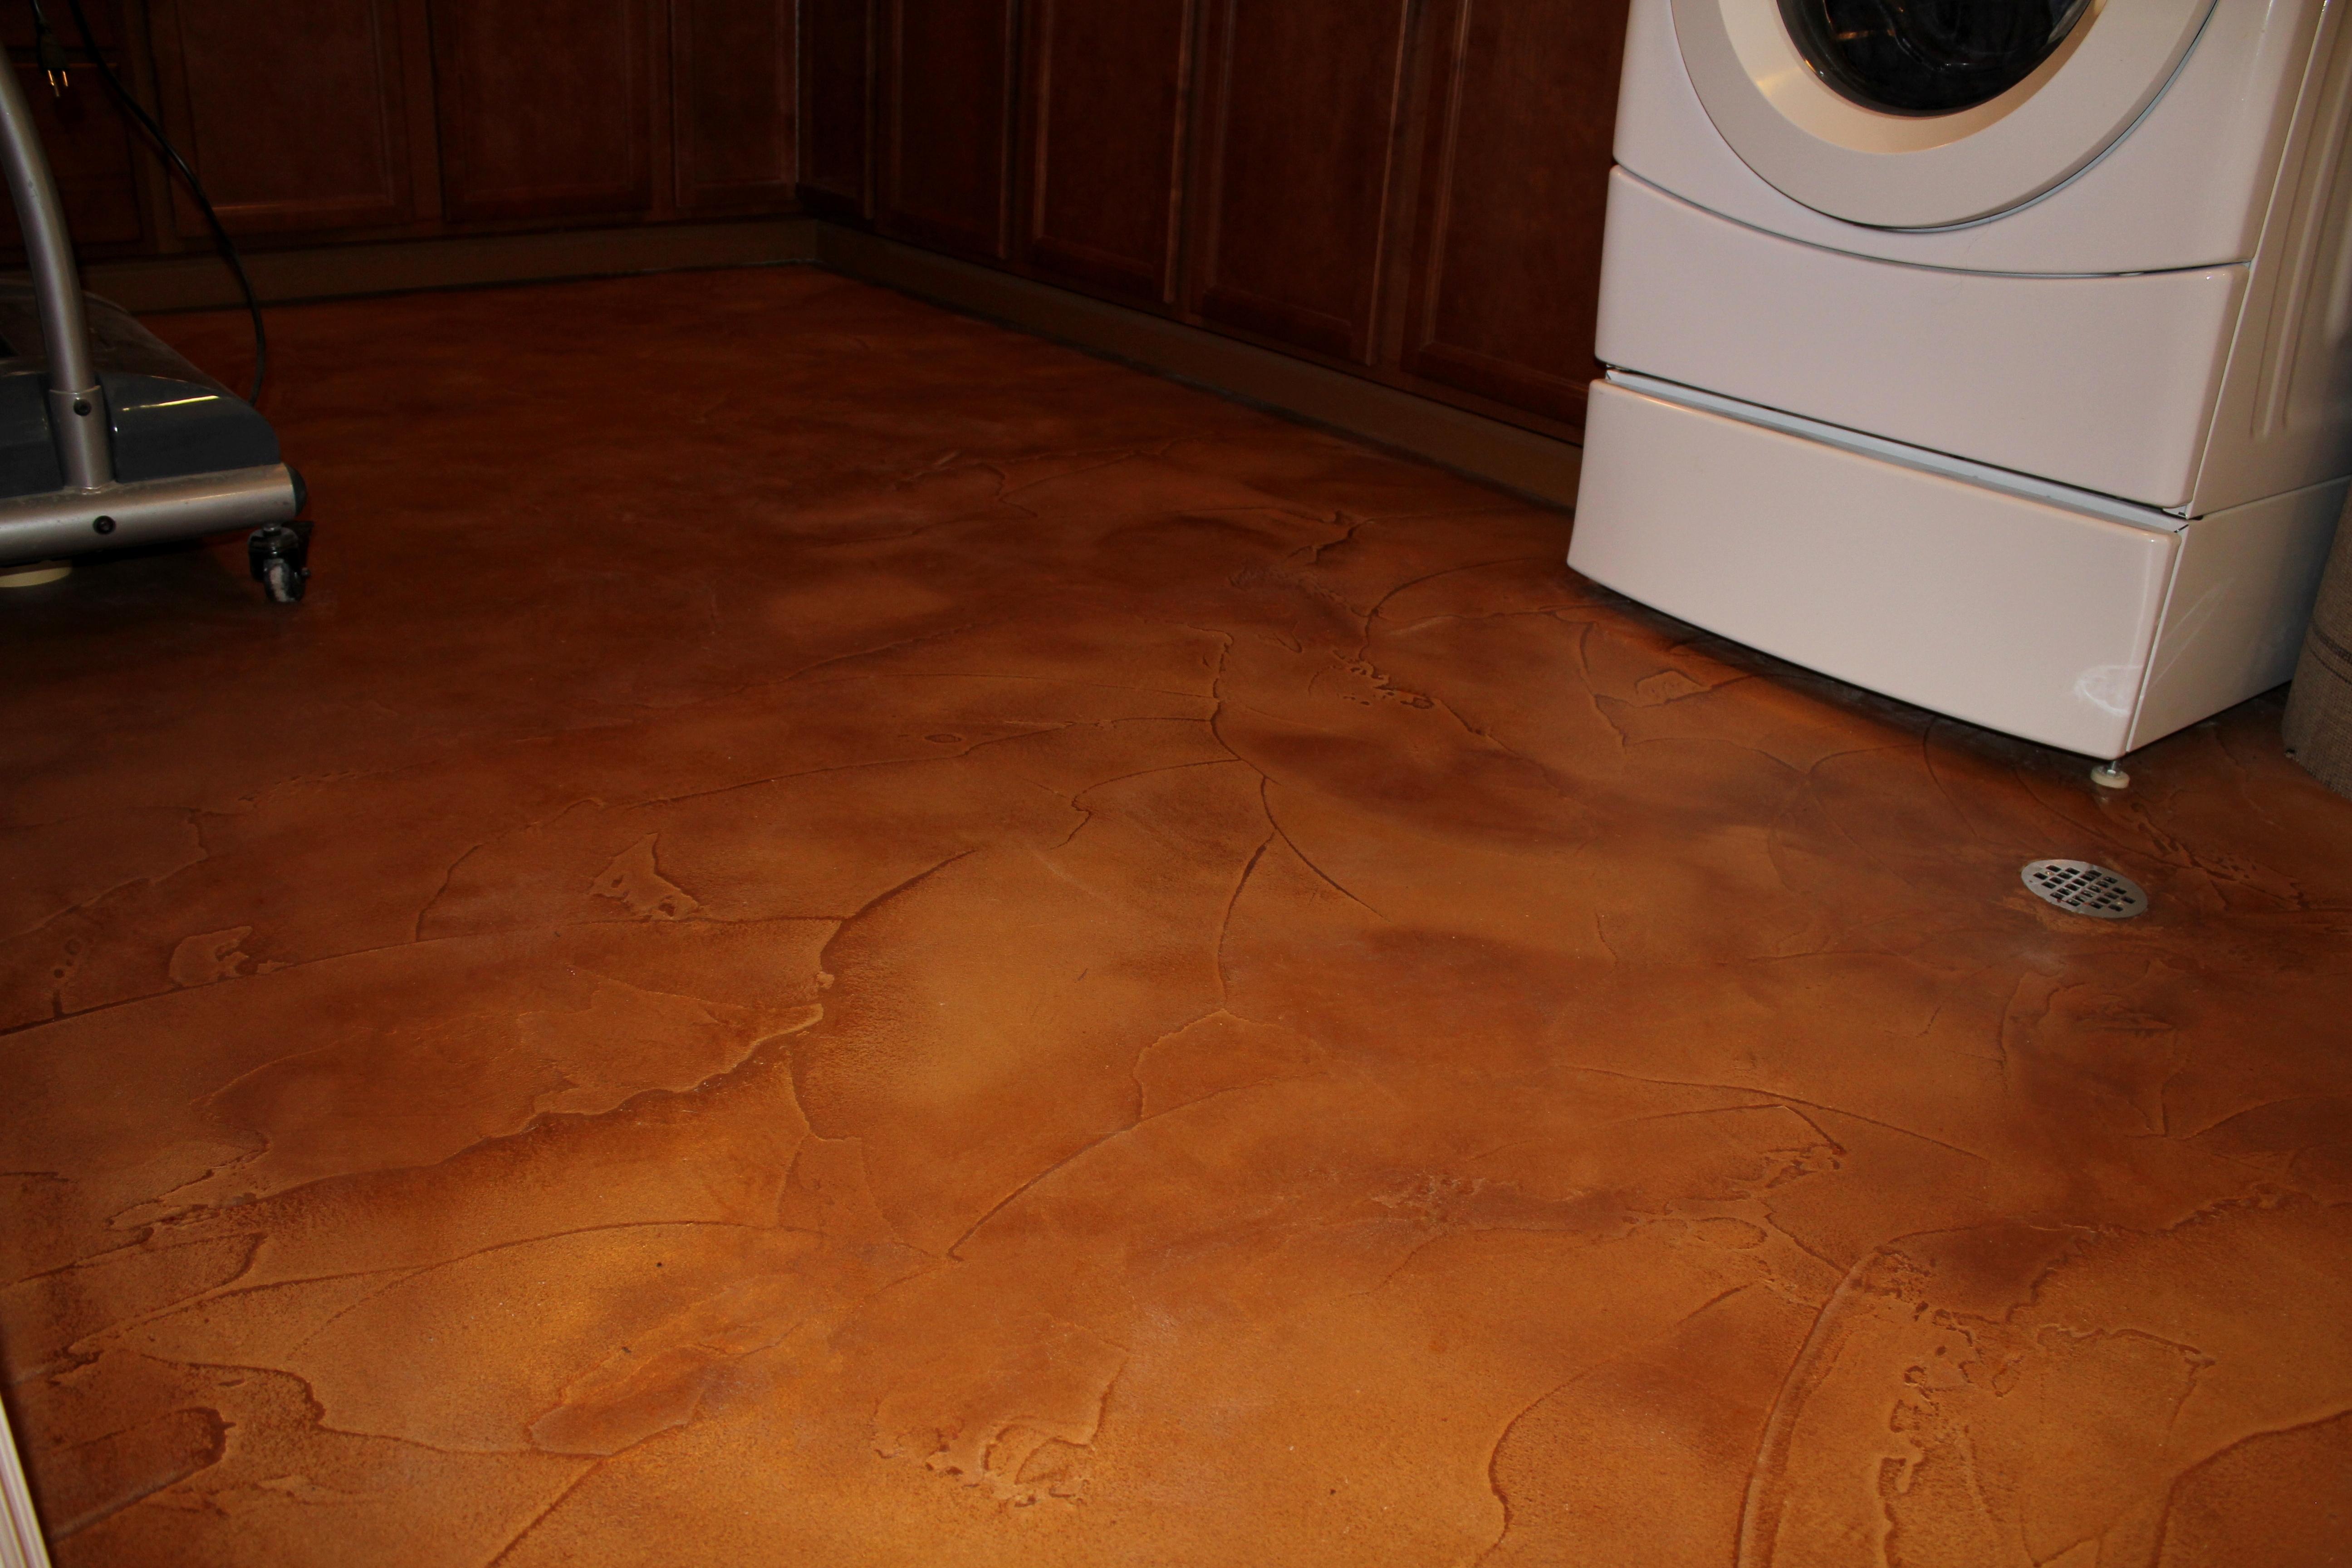 Moisture Basement Flooring Options5184 X 3456